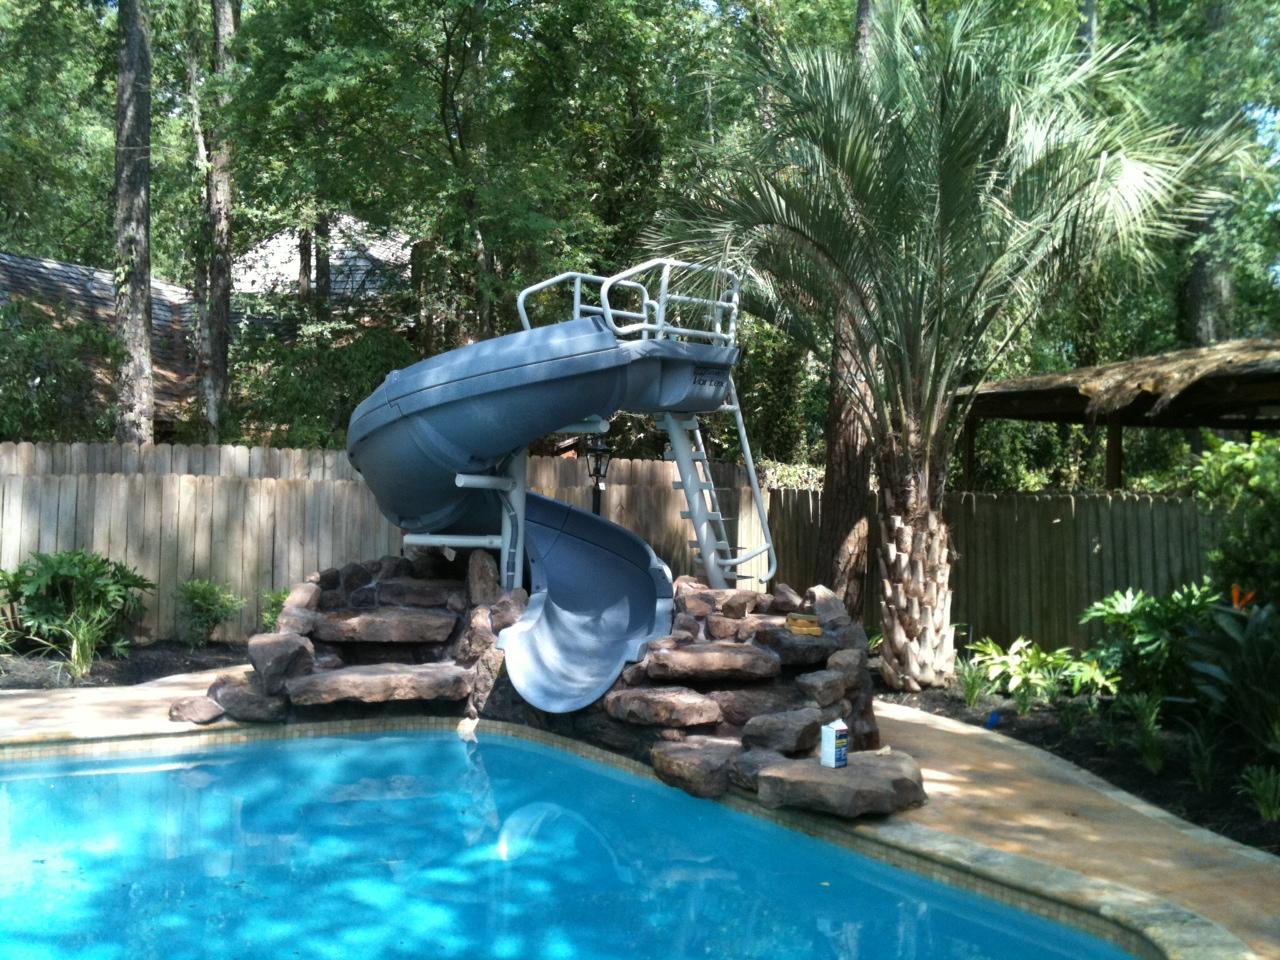 Vortex Inground Pool Slide Closed Flume and Ladder (Blue)